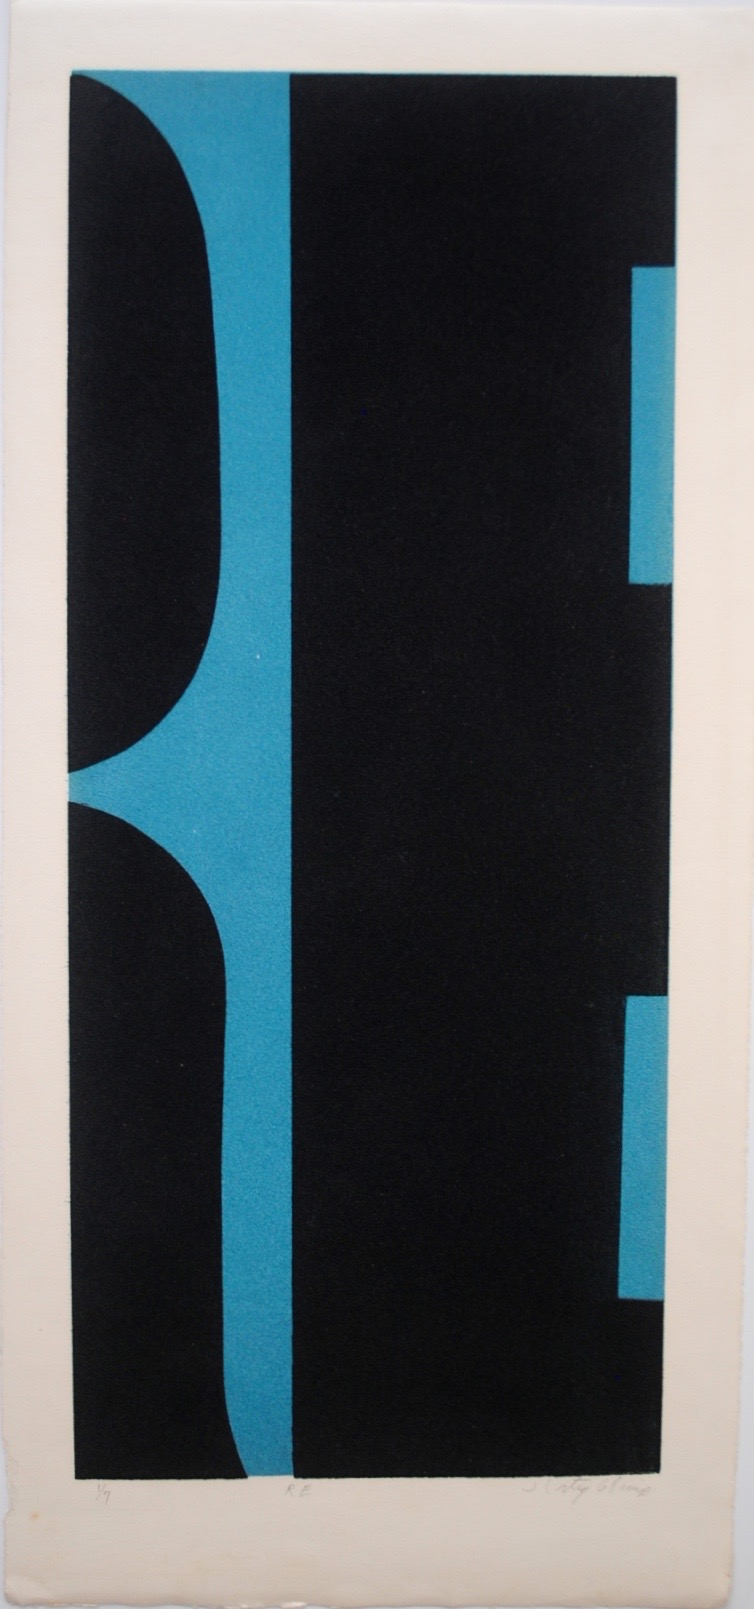 RE, 1968